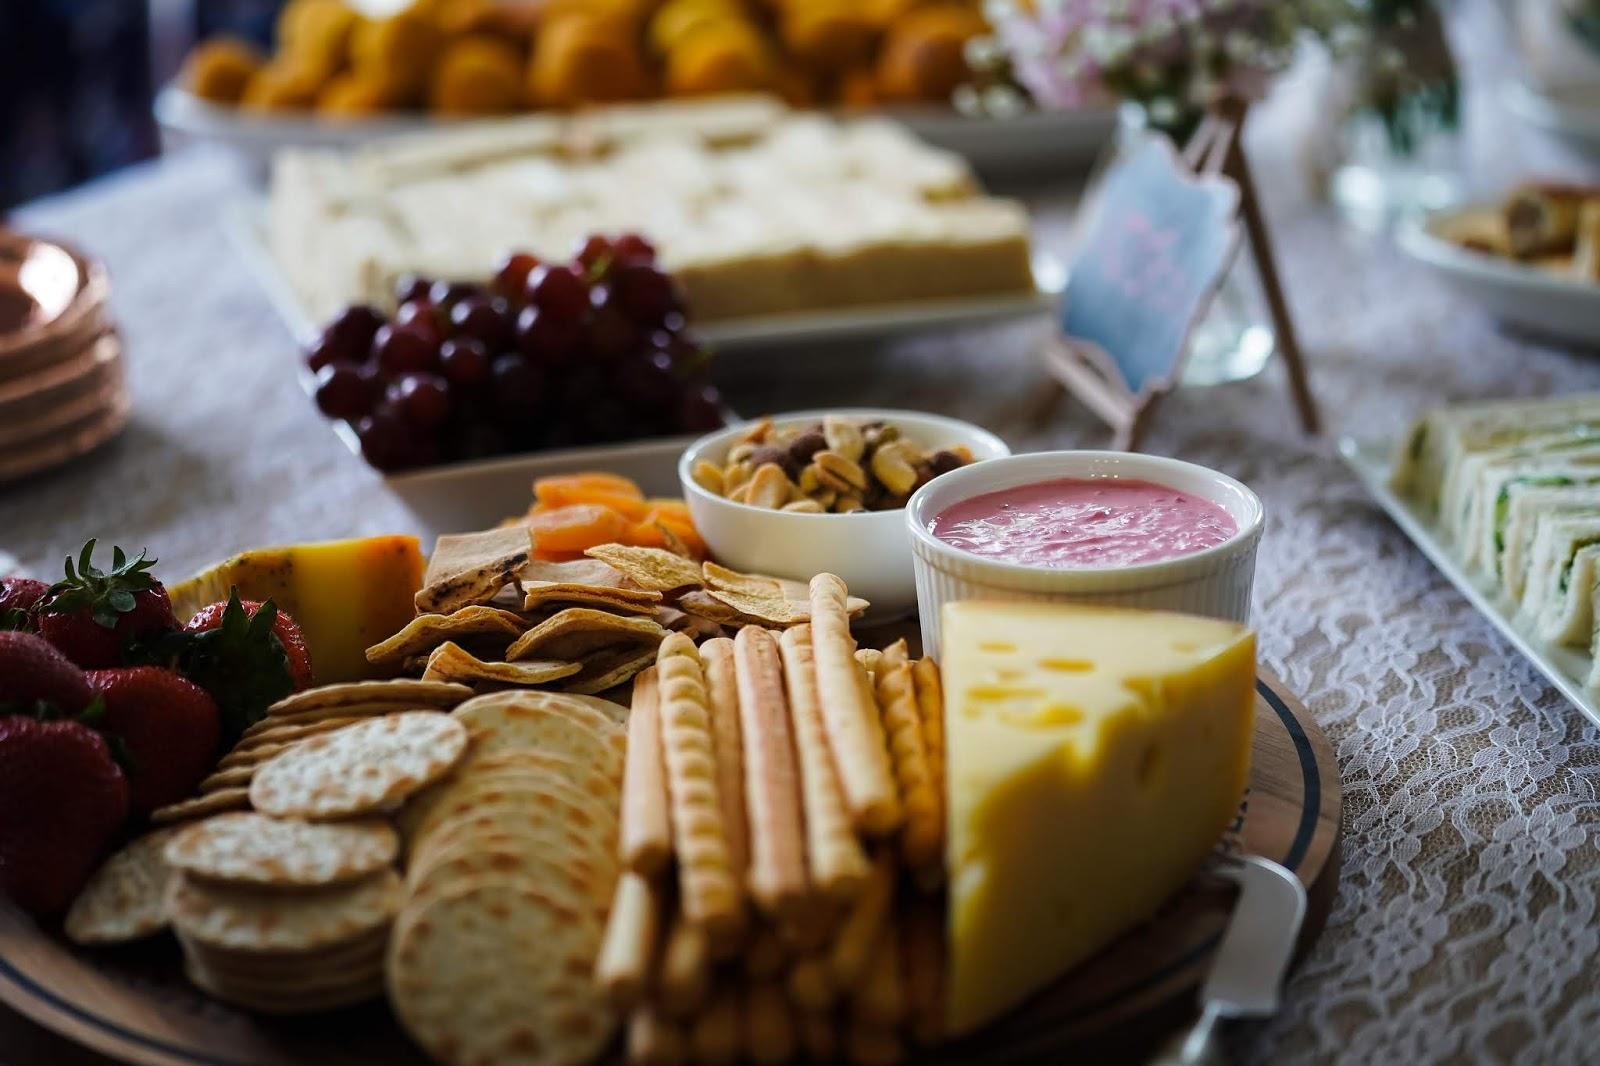 Keto Cheese | Keto Recipes and Keto Snacks Full Guide.